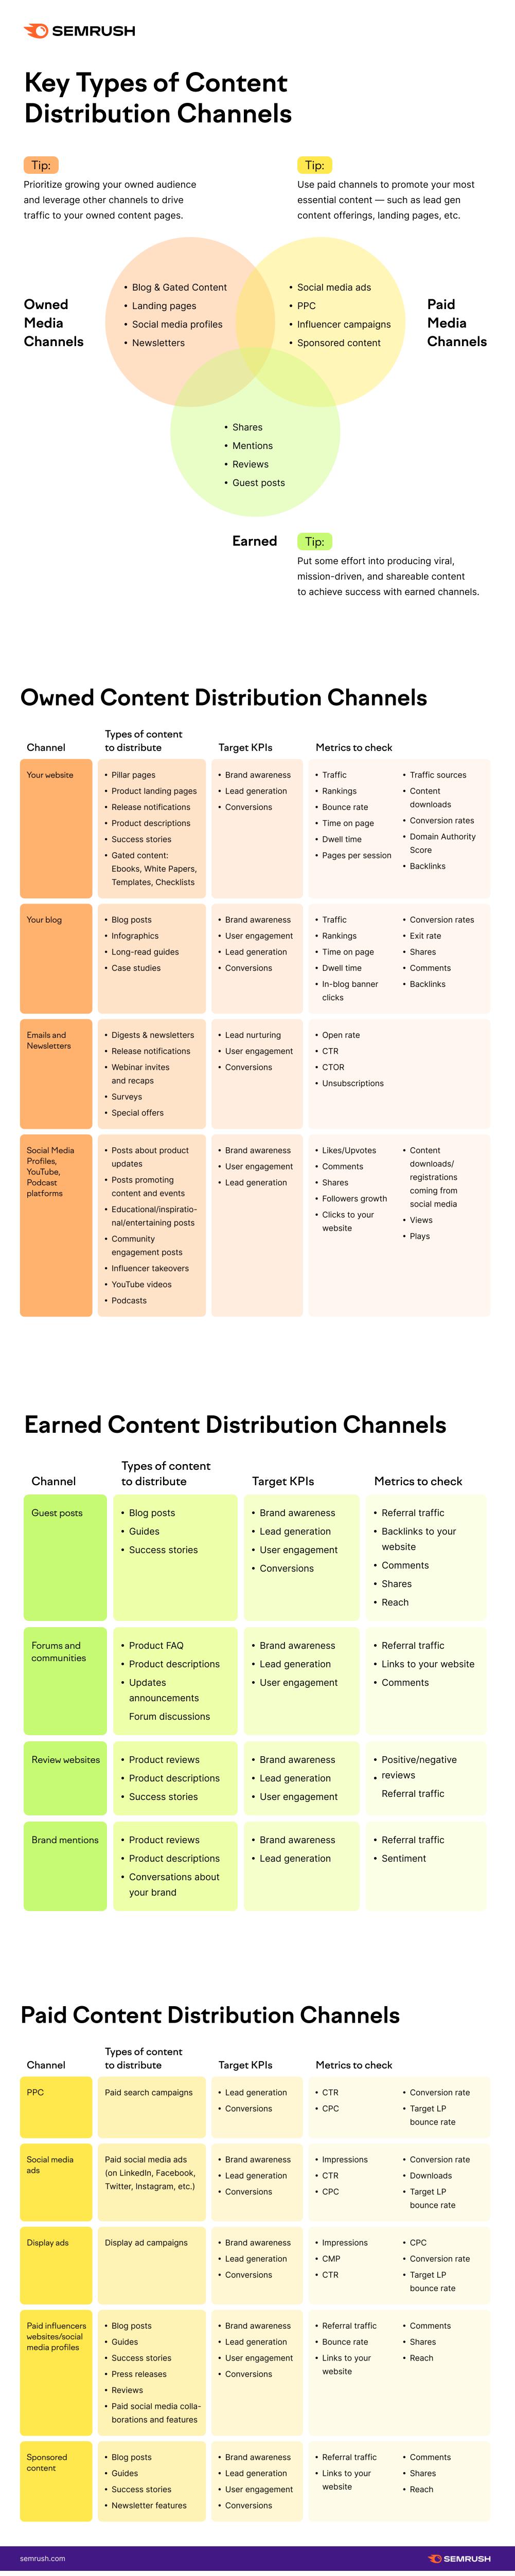 Content distribution channels overview